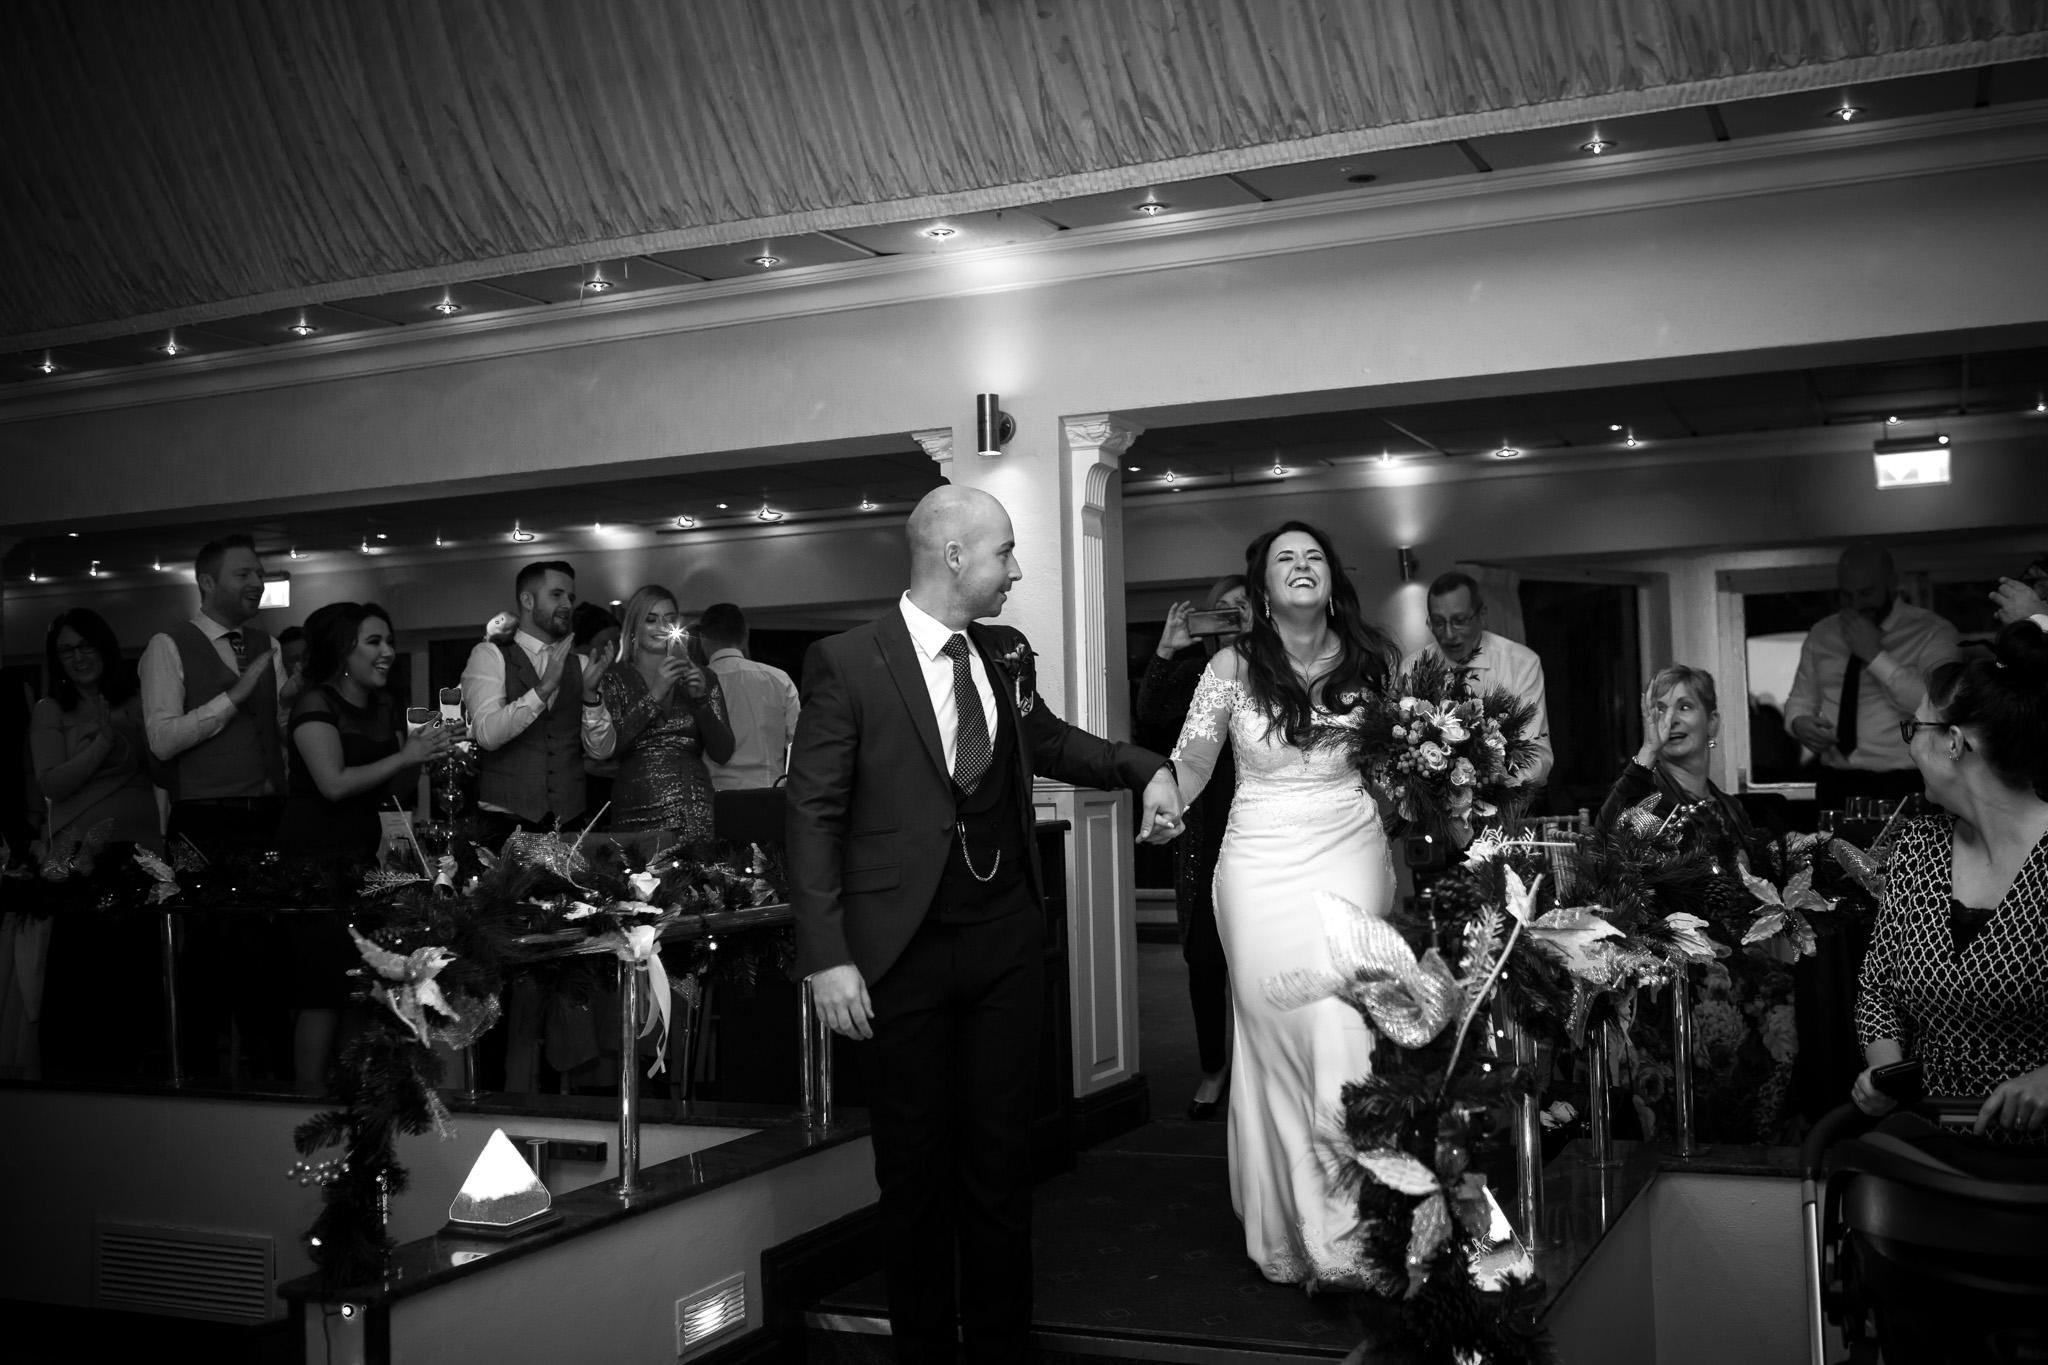 Mark_Barnes_Northern_Ireland_wedding_photographer_Harveys_Point_Donegall_Wedding_photography-Adam&Gemma-47.jpg